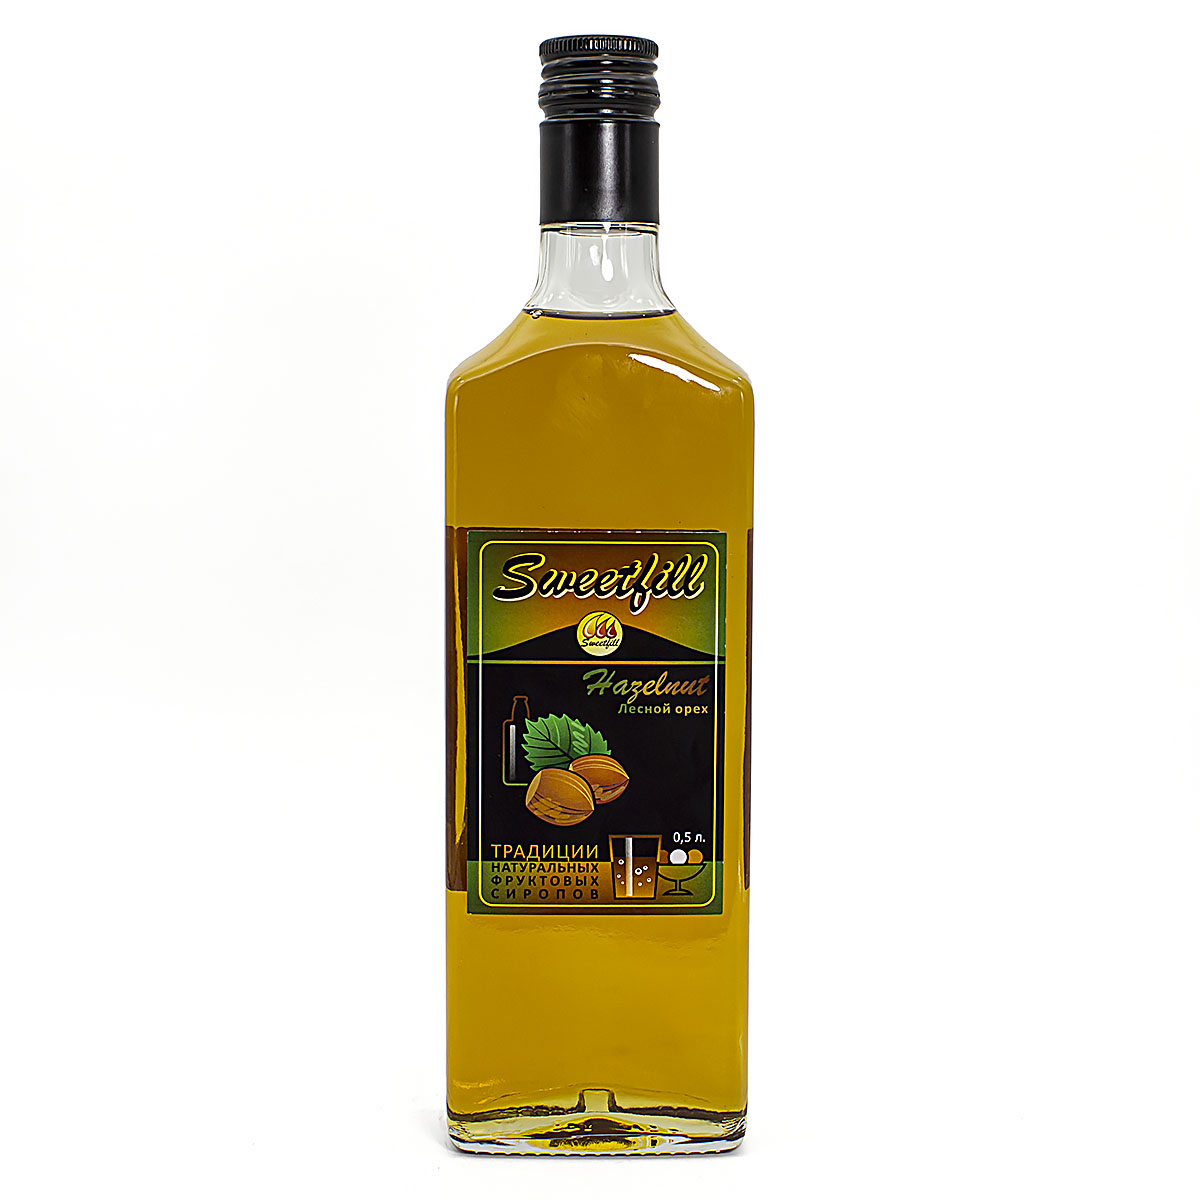 Сироп SweetFill Лесной орех, 0,5 л vedrenne карамель сироп 0 7 л